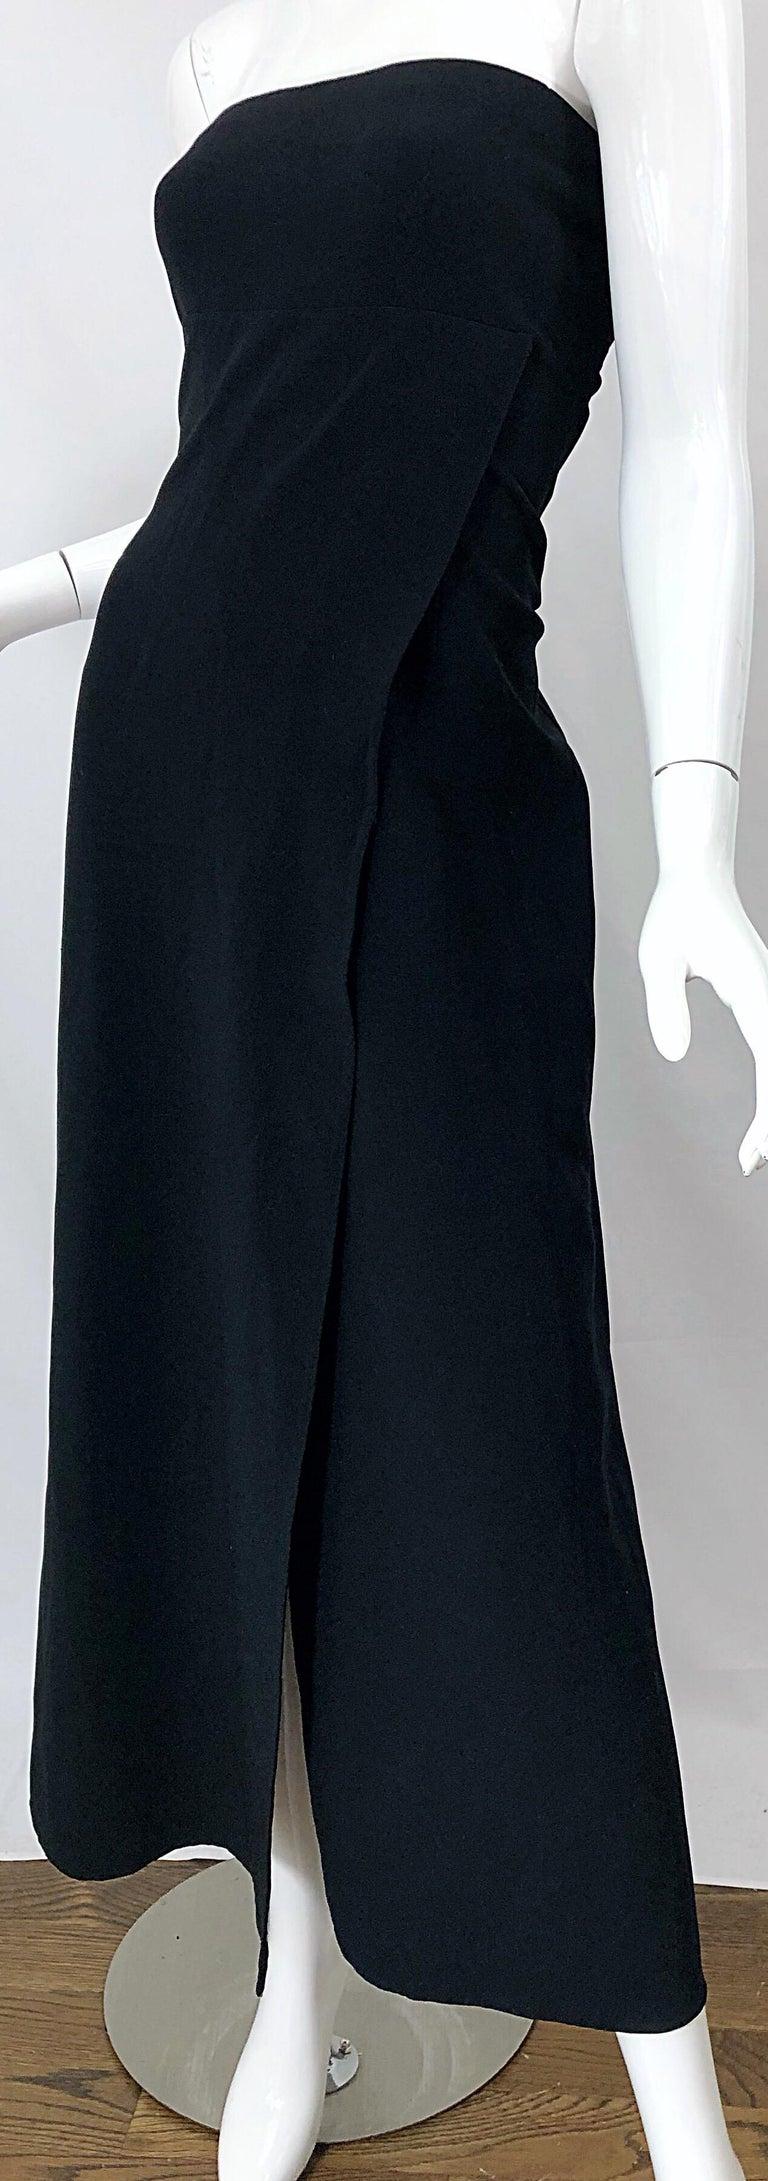 1990s Donna Karan New York Size 4 Black Strapless Vintage 90s Gown Maxi Dress For Sale 6